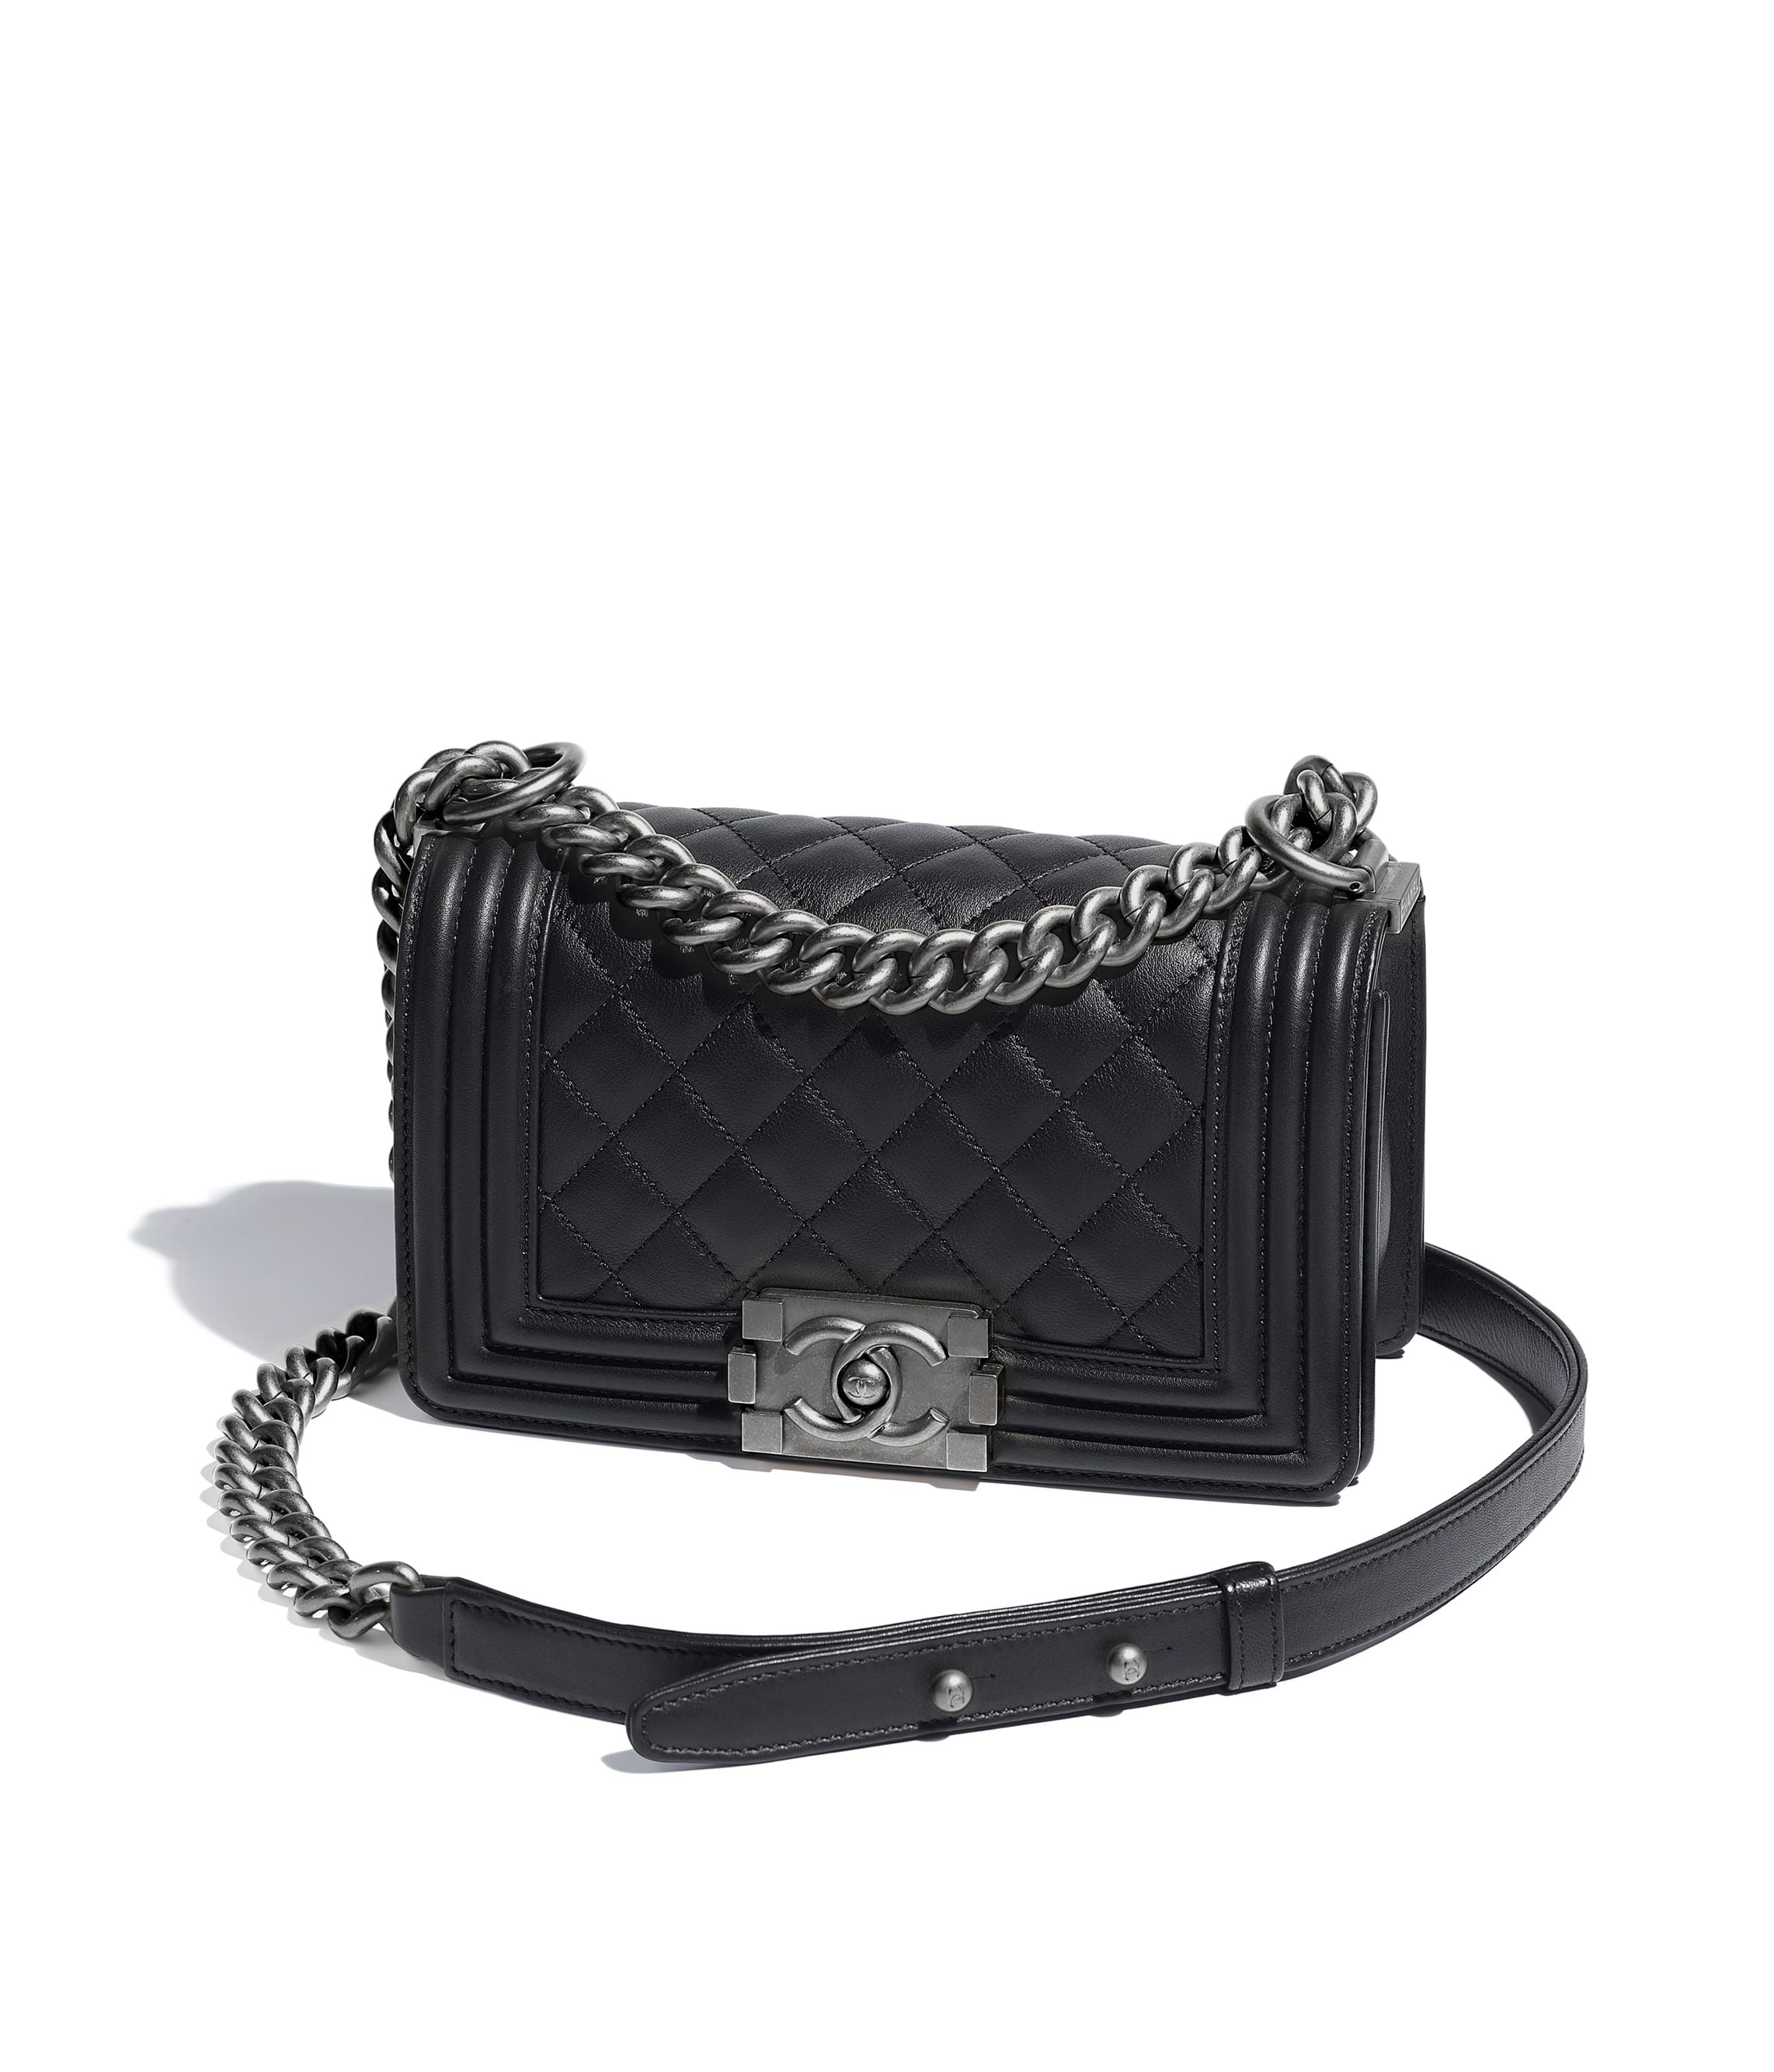 1457c68fb6c02 Small BOY CHANEL Handbag, calfskin & ruthenium-finish metal, black - CHANEL